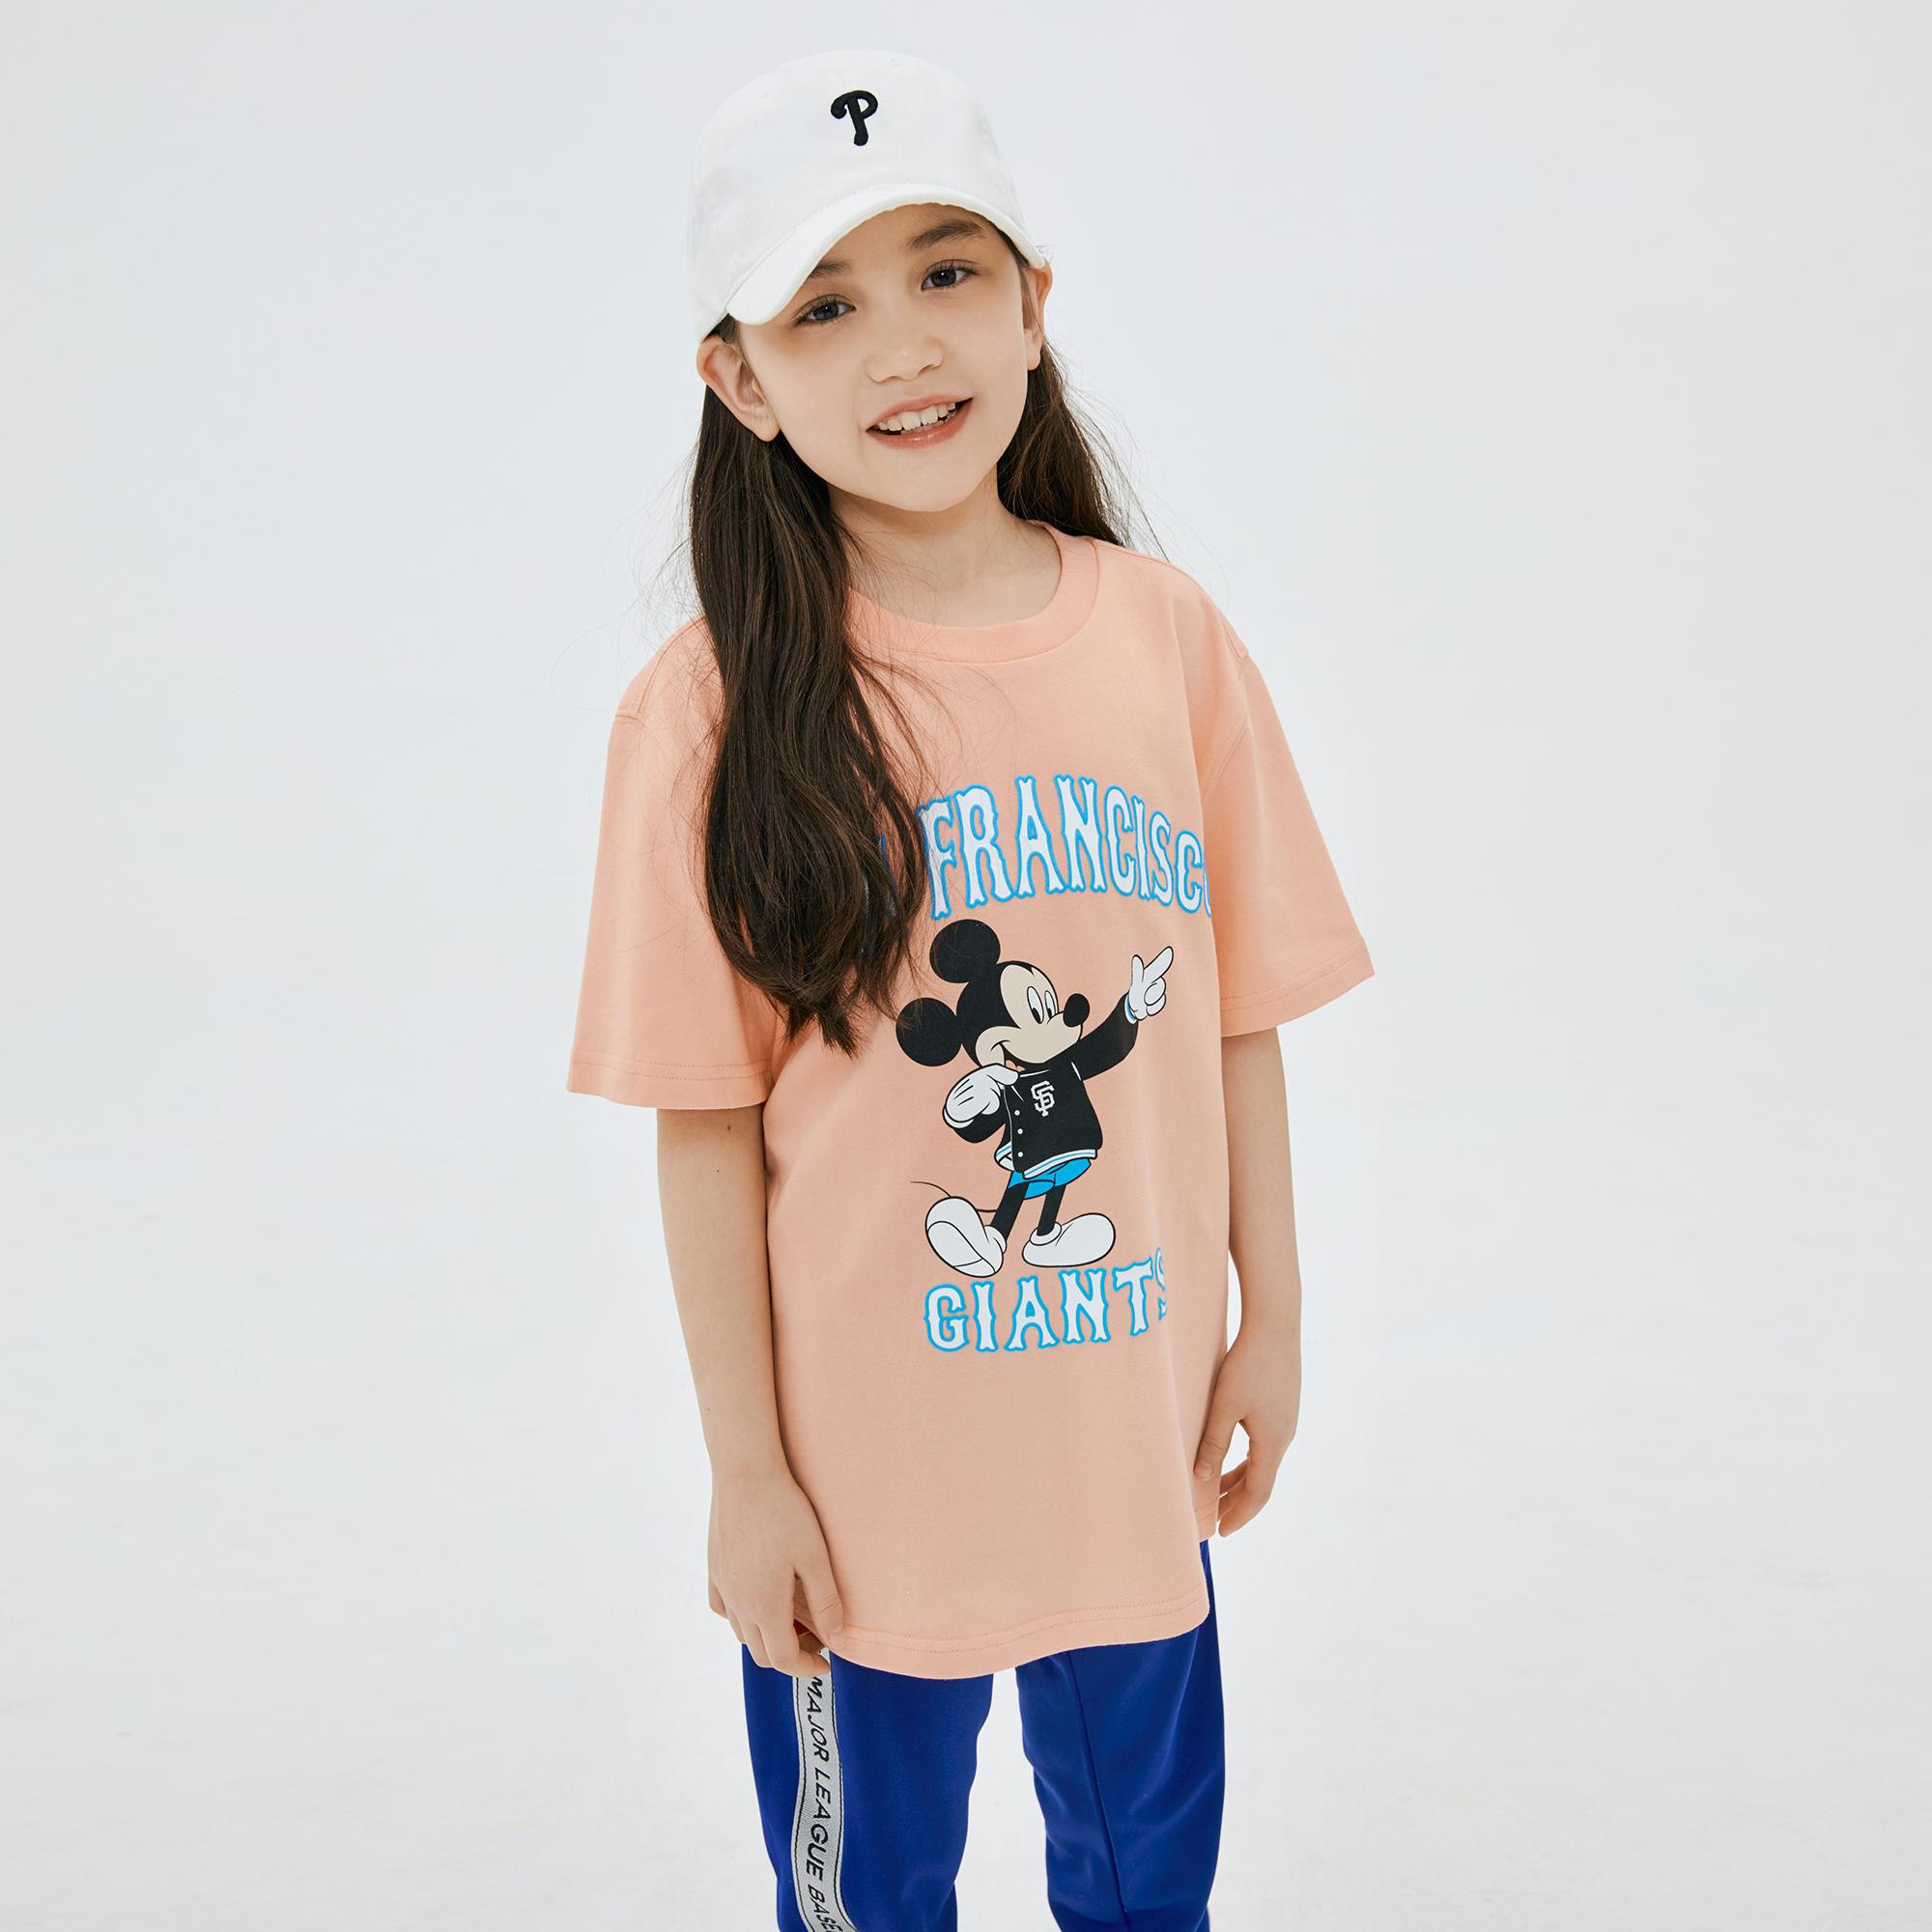 MLB x DISNEY 미키마우스 티셔츠 샌프란시스코자이언츠